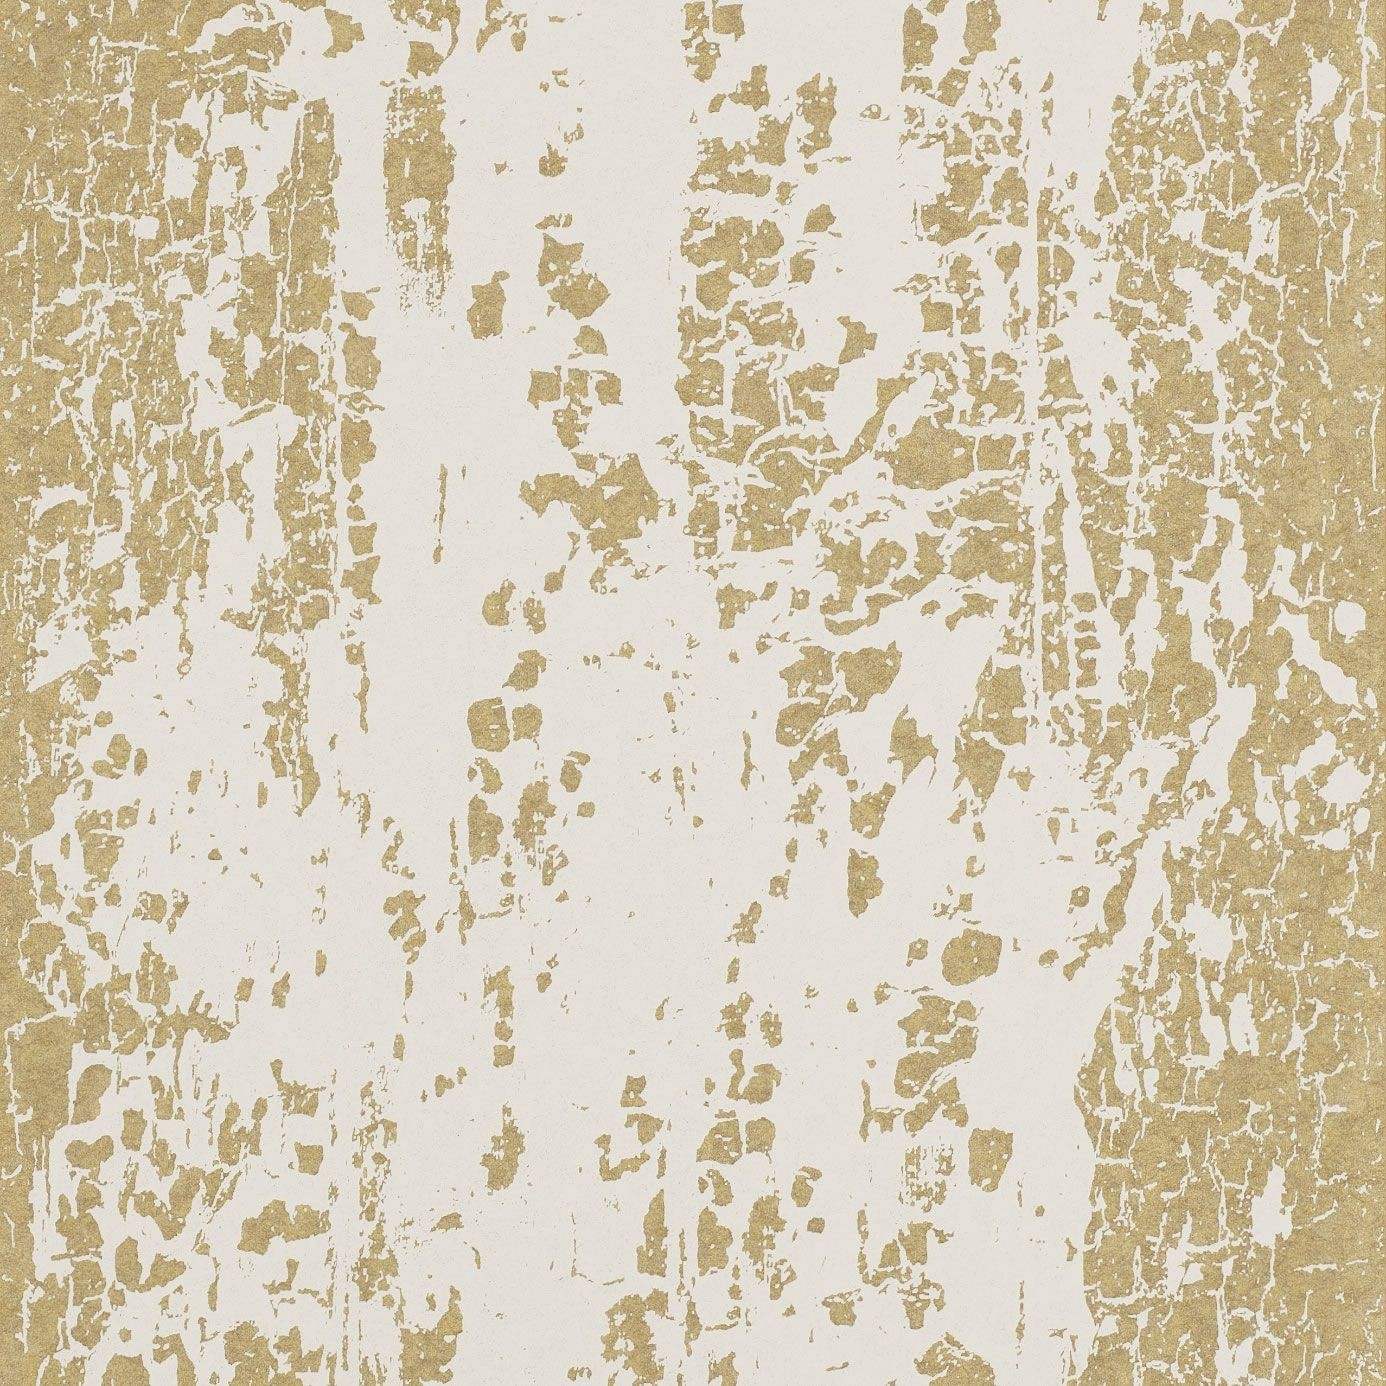 Damask Wall Sticker Gold And Cream Wallpaper Wallpapersafari